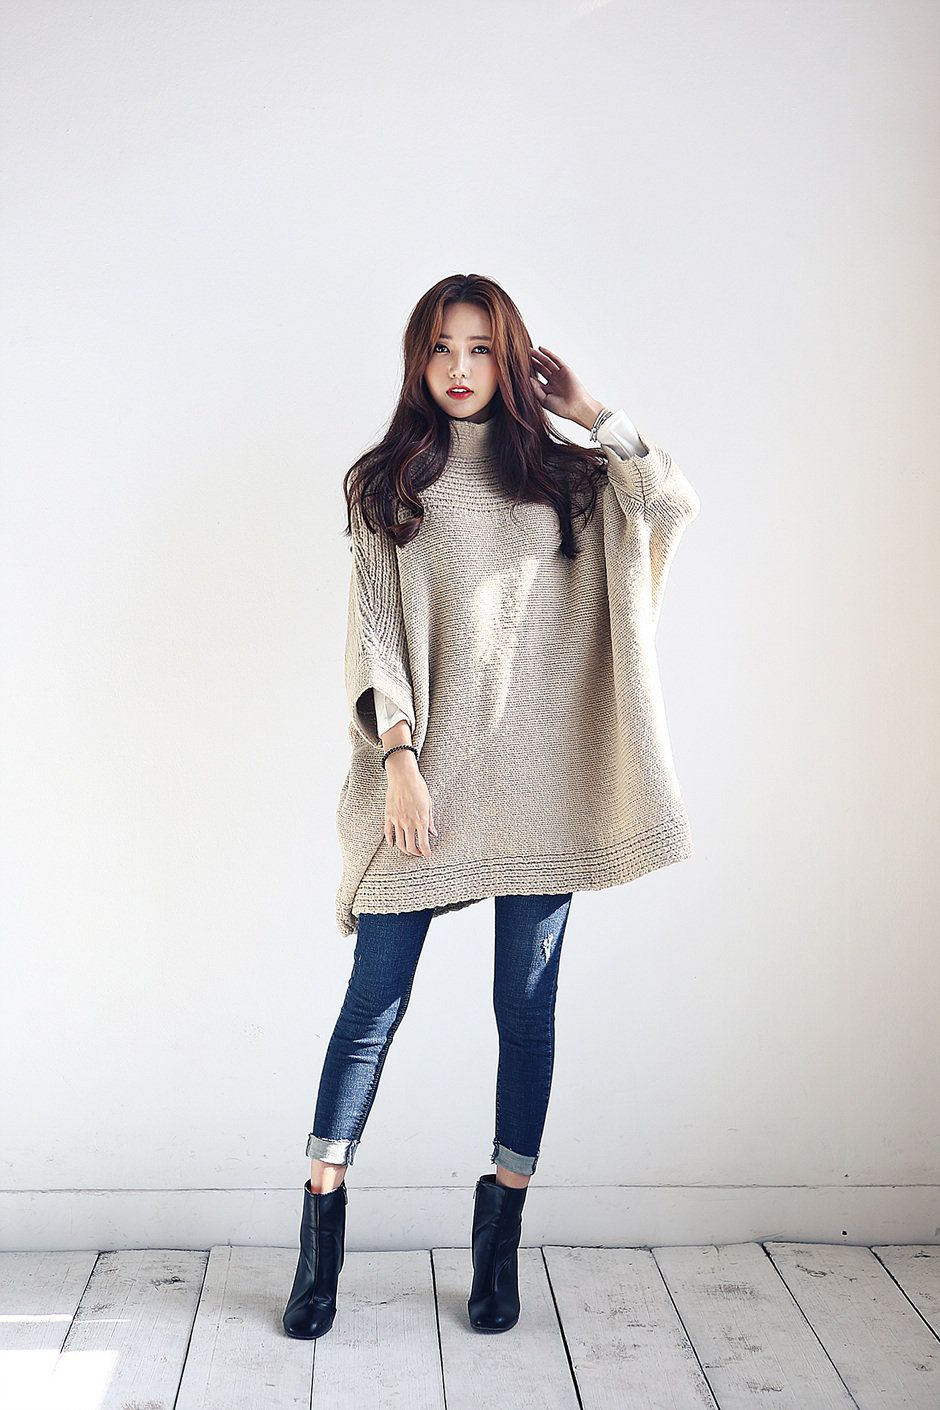 Pin by Korean Fashion on Korean Fashion | Korean fashion ...